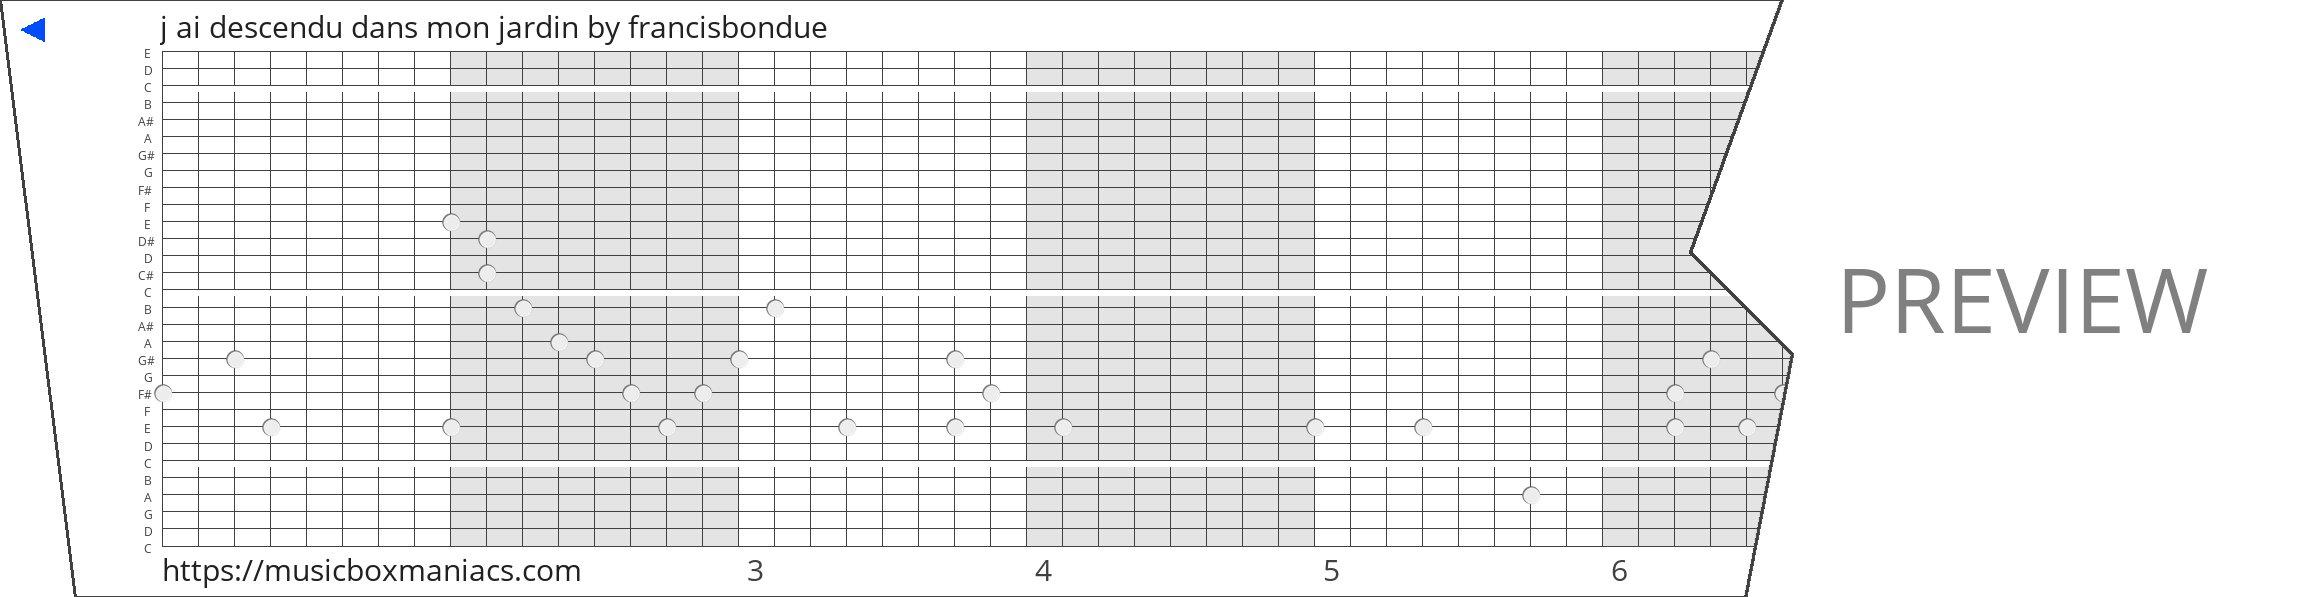 j ai descendu dans mon jardin 30 note music box paper strip